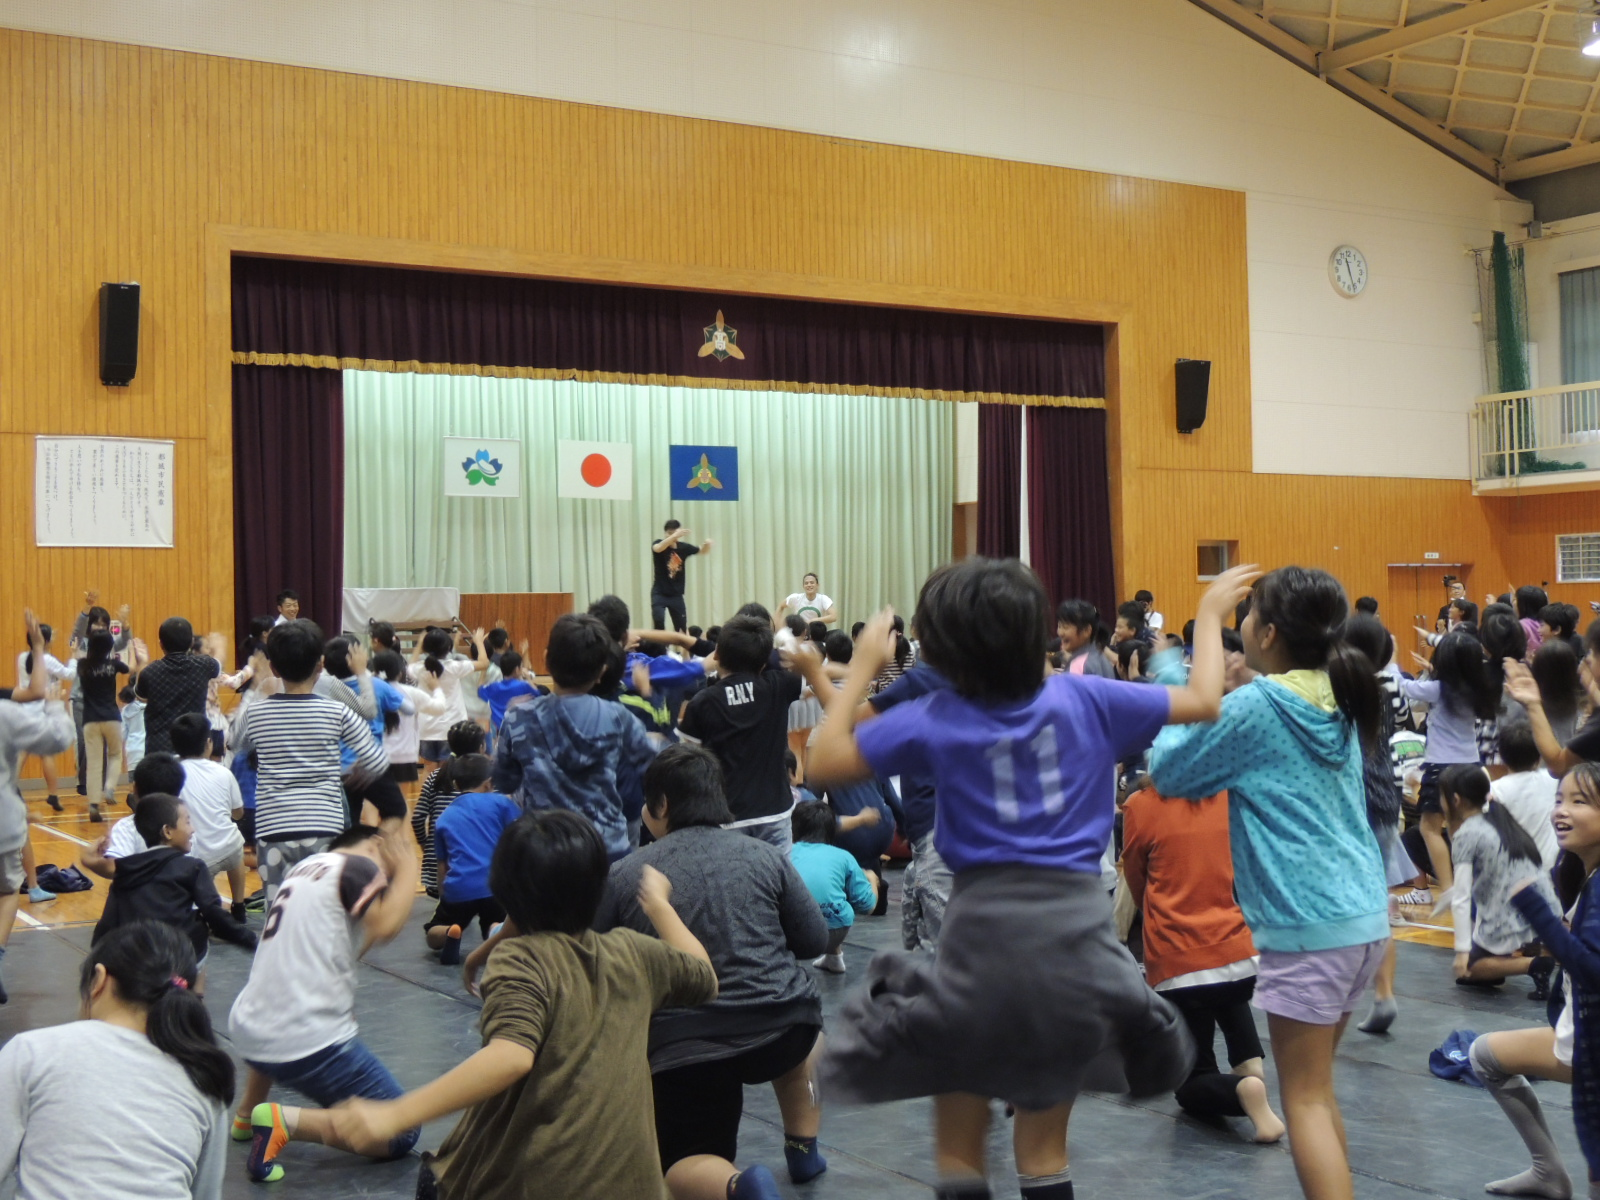 http://mj-hall.jp/performance/30auto4.JPG